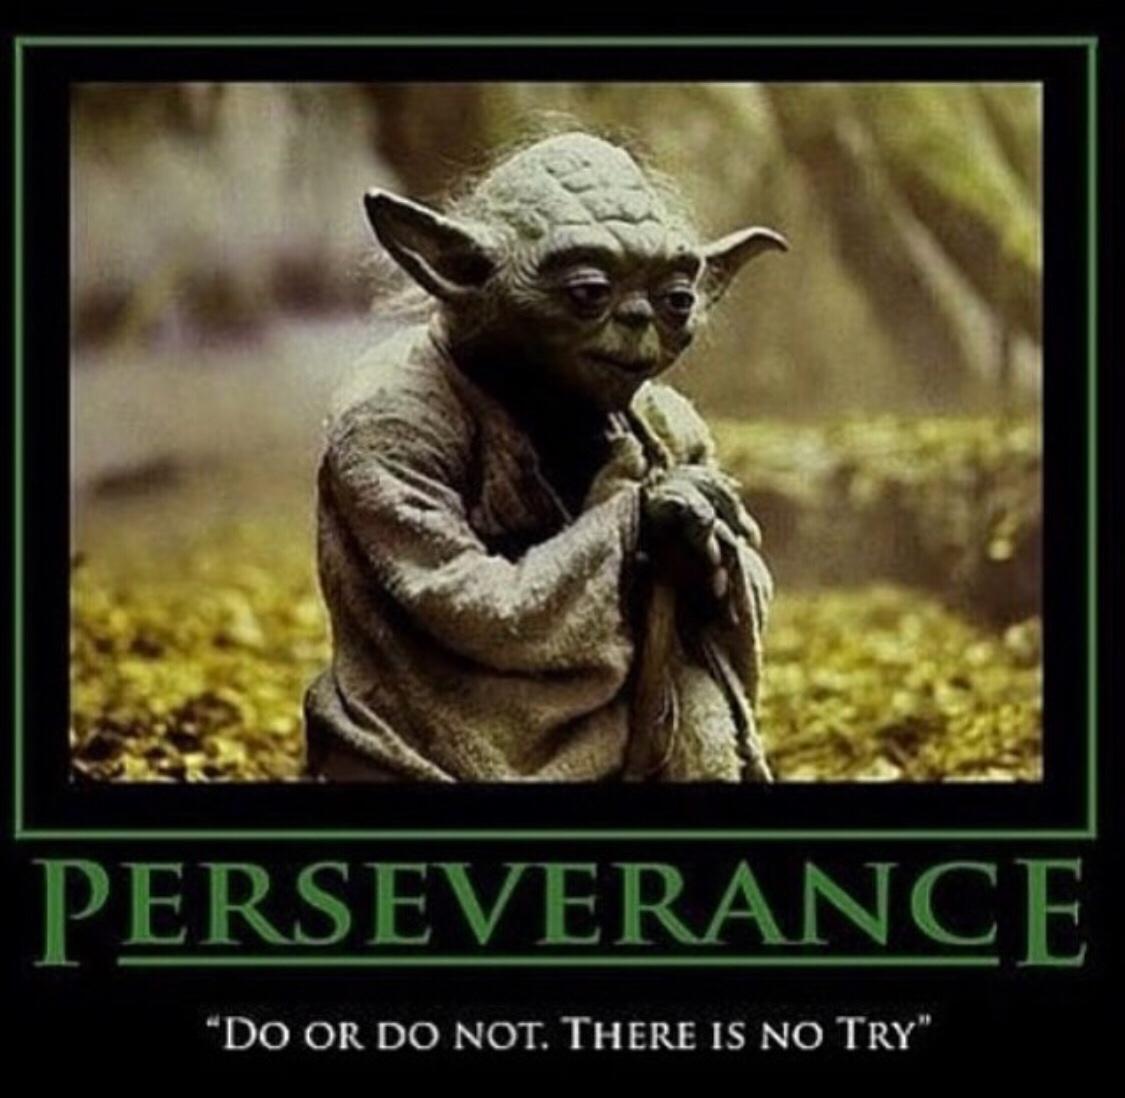 Truth Serum, Conjure Work, Magus72 blog, perseverance